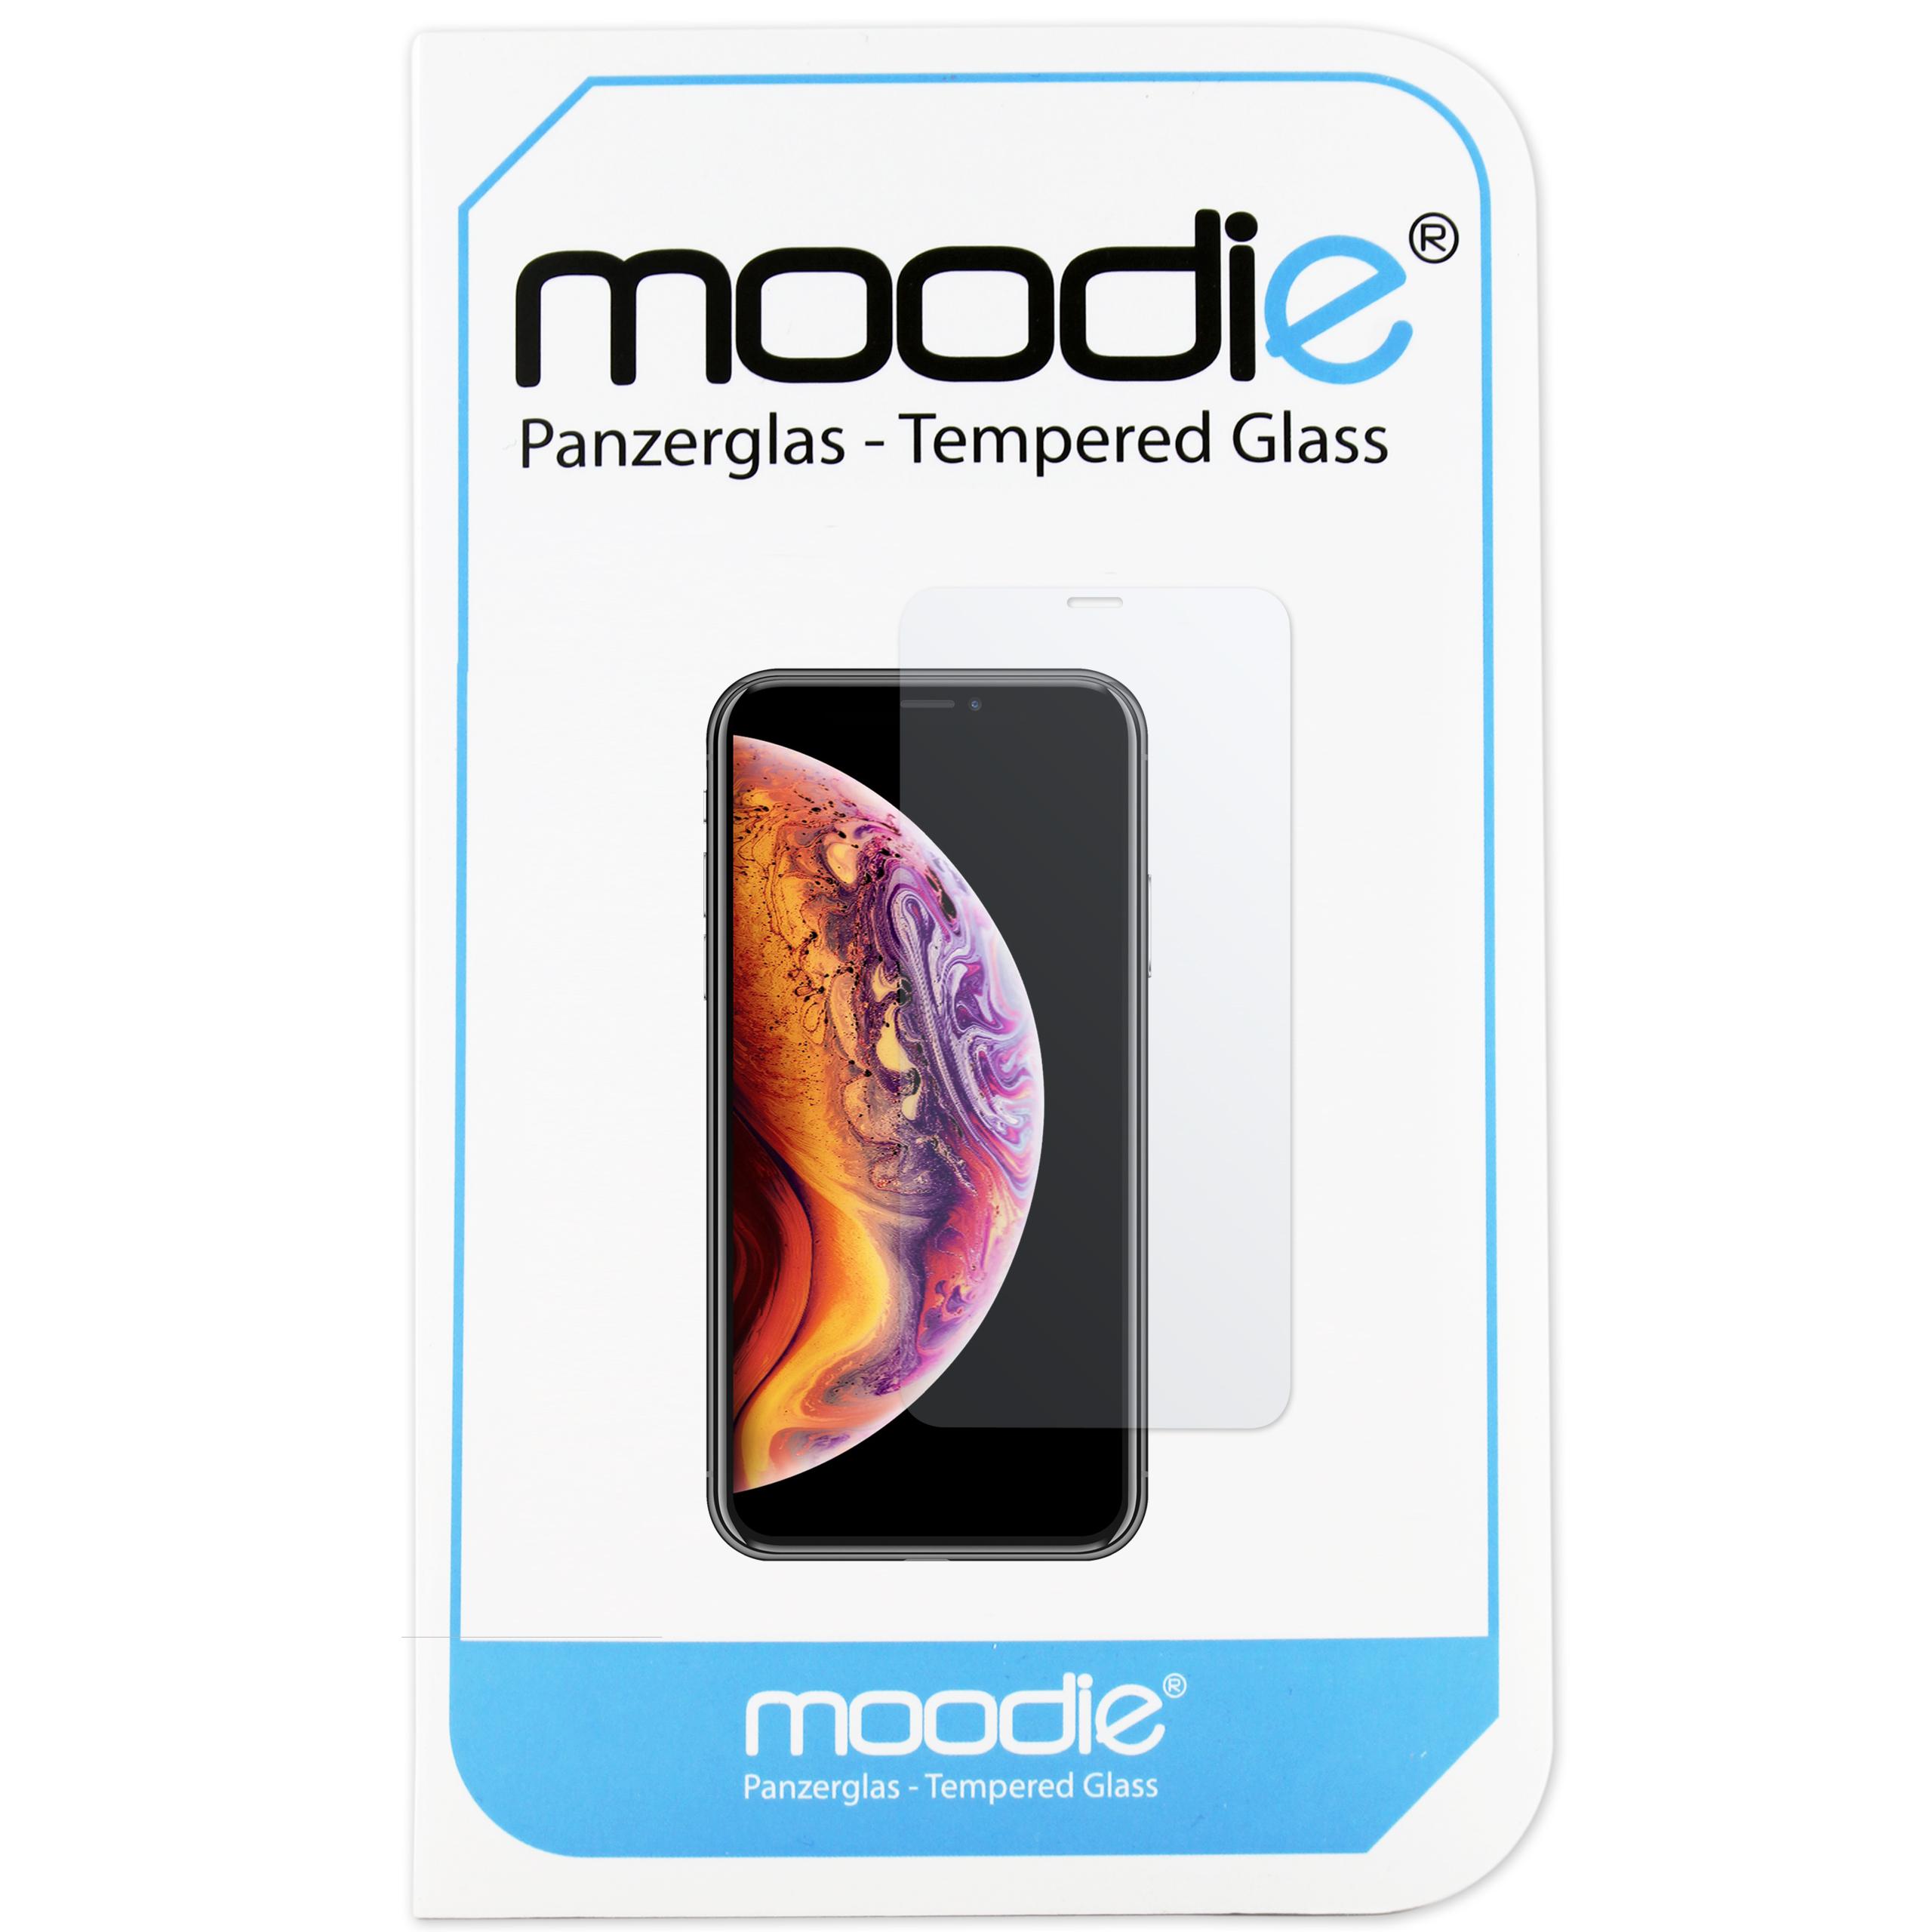 iPhone-XS-Panzerglas_Verpackung